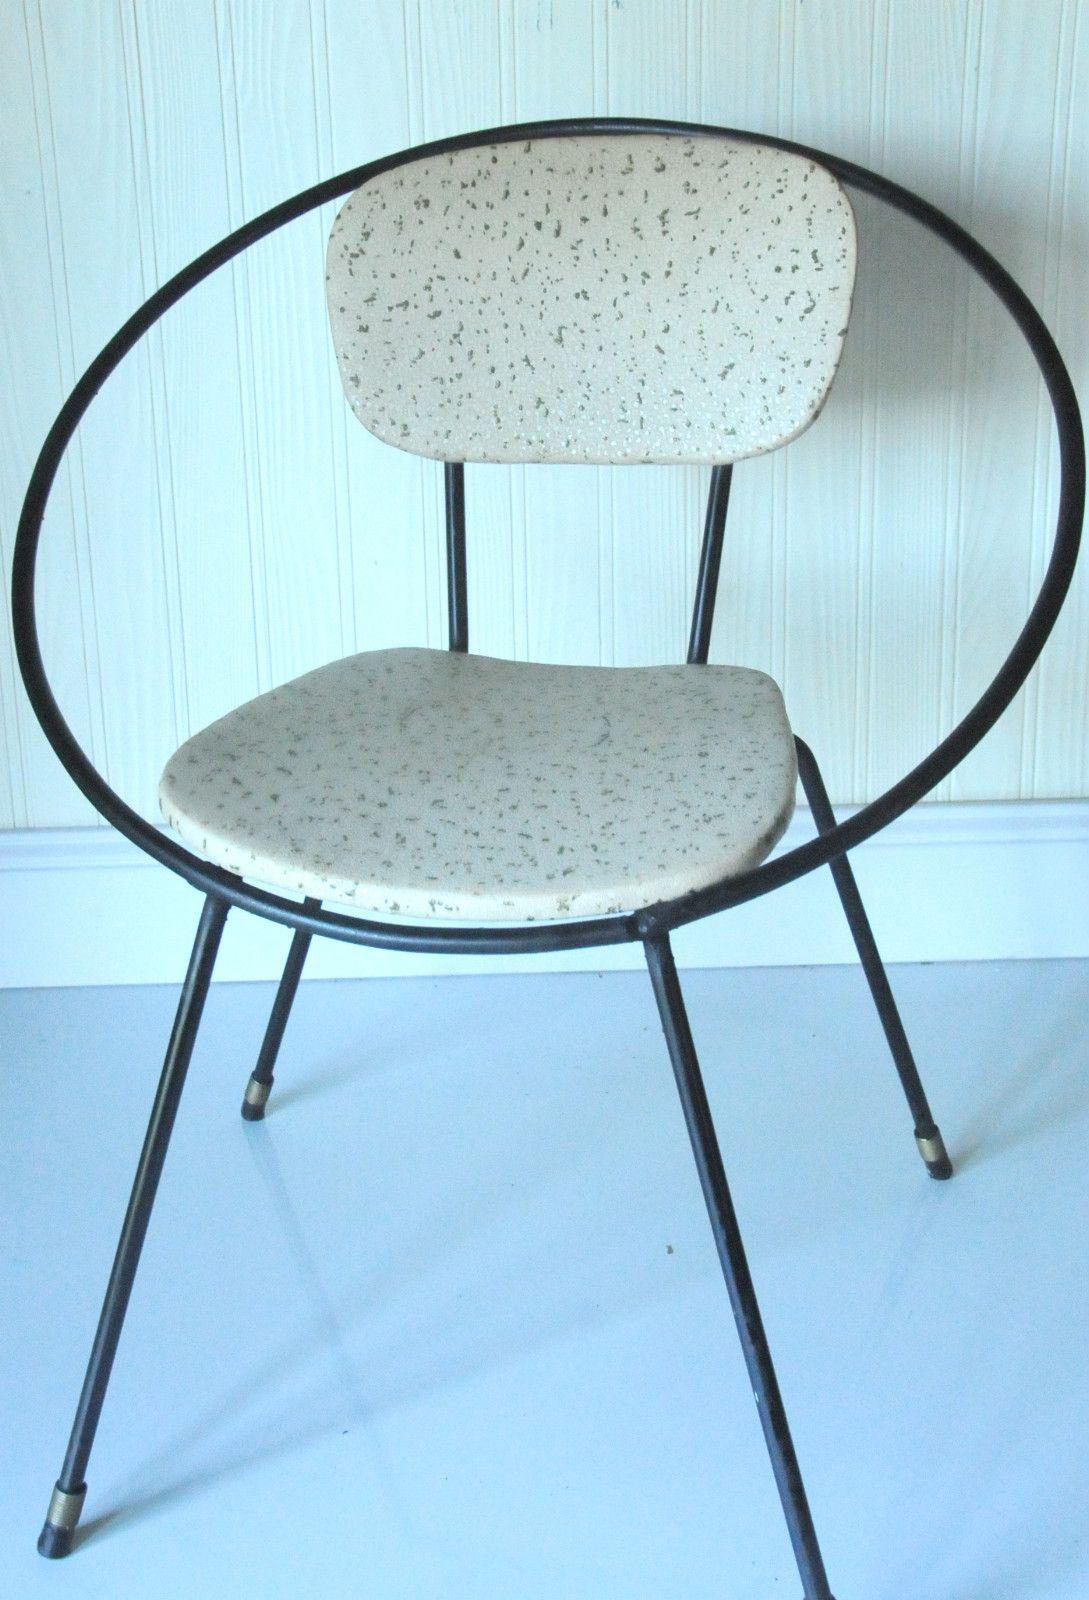 Incredible Vintage Childrens Chair Eames Era Midcentury Modern Kids Creativecarmelina Interior Chair Design Creativecarmelinacom